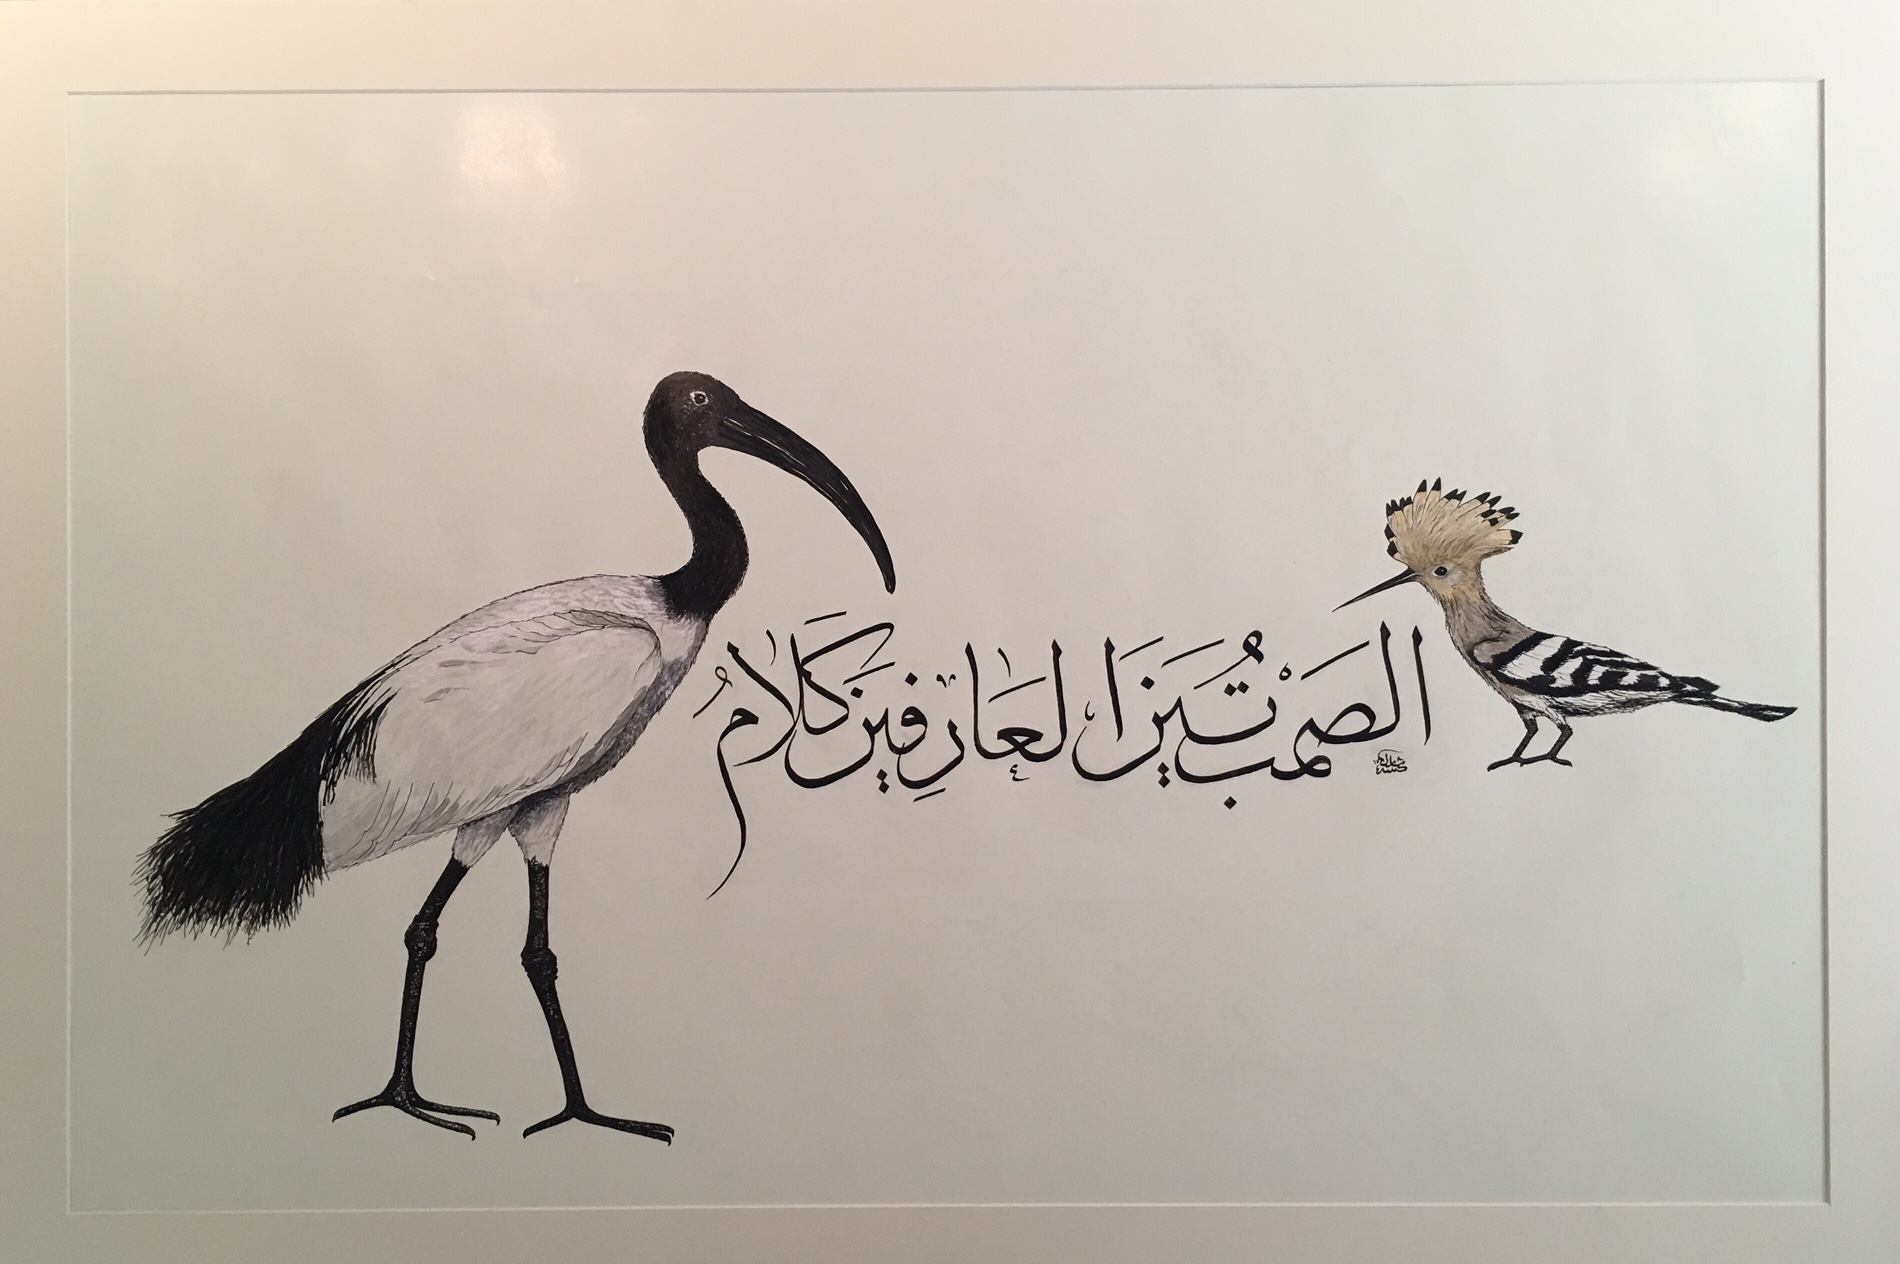 Abu munjil and the hudhud final by CharLes 17